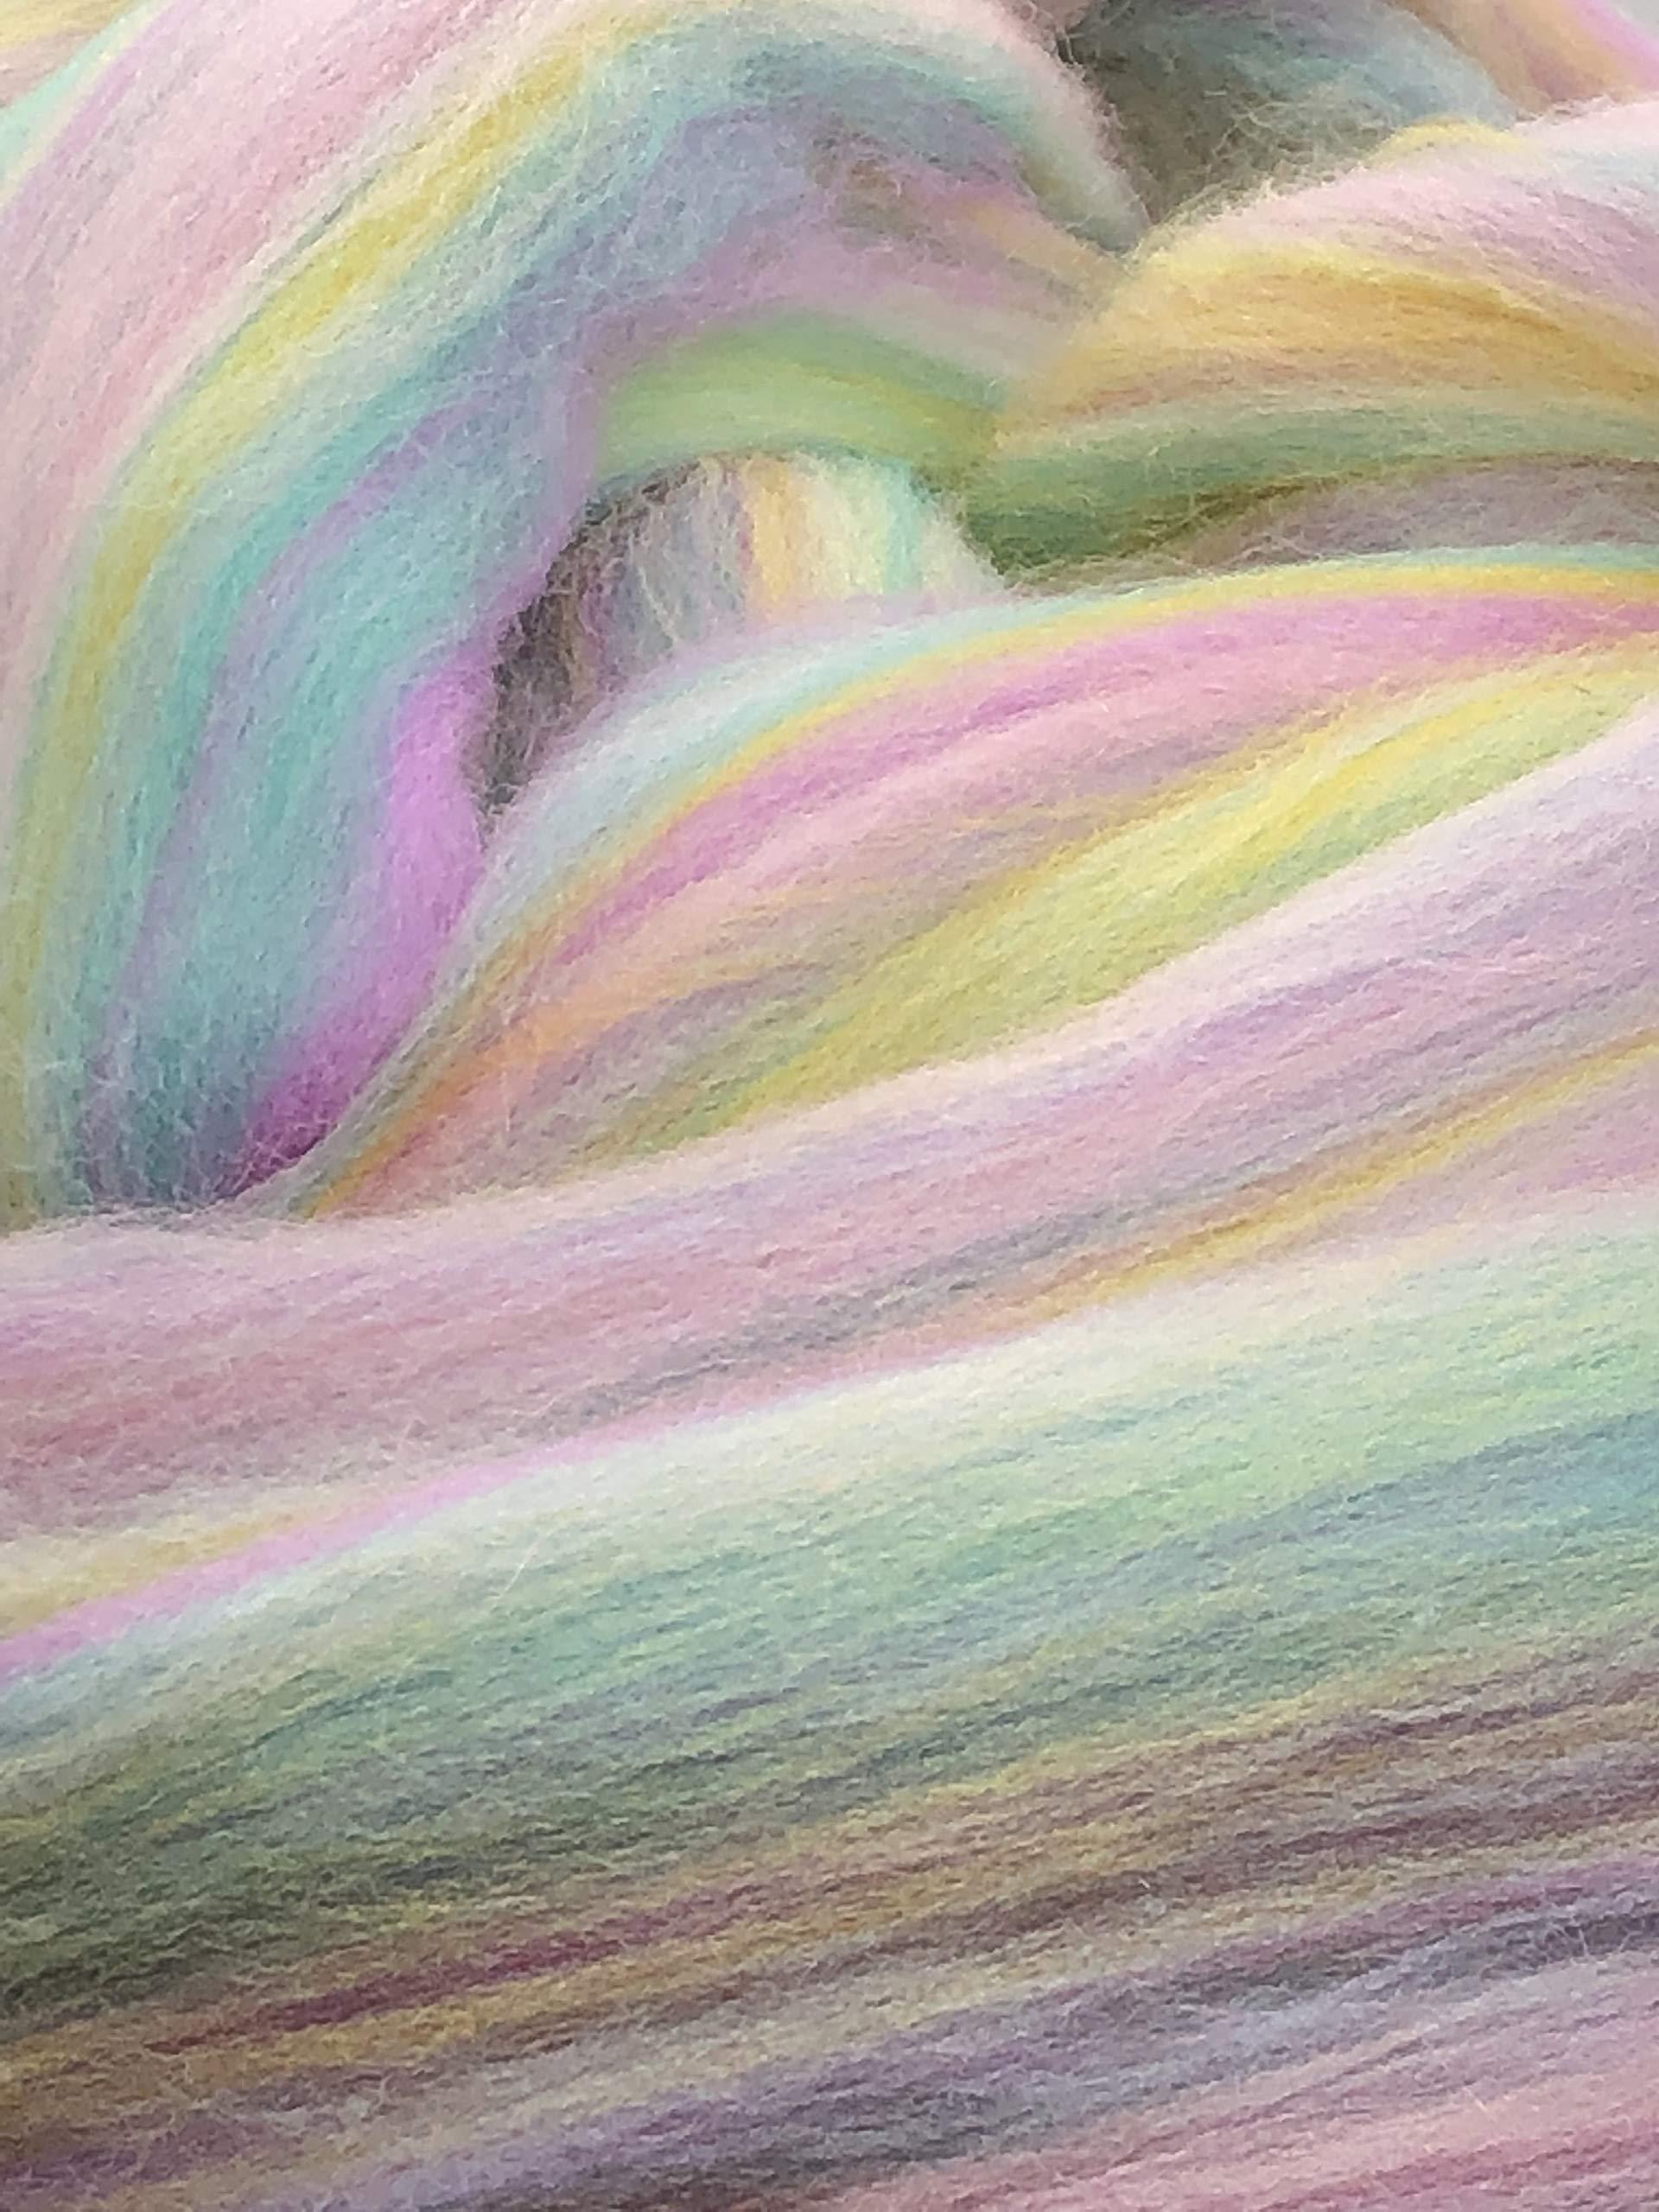 Shep's Pastel Rainbow Merino Wool Top Roving Spinning, Felting Crafts USA (4lb) by Shep's Wool (Image #2)